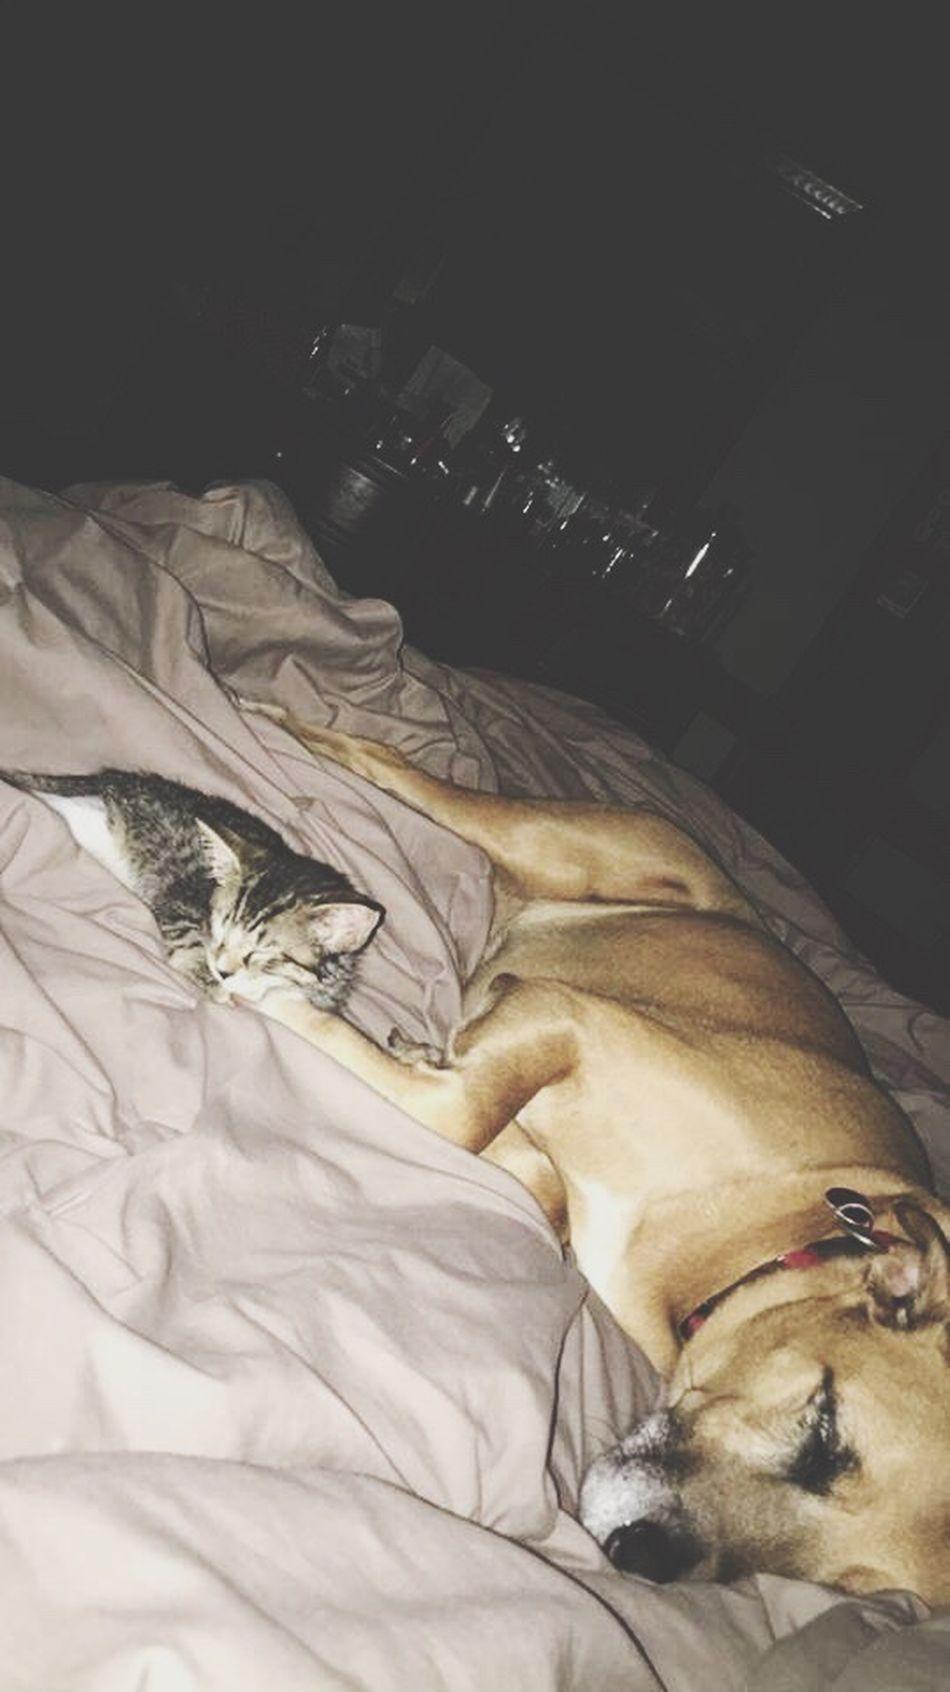 Adorable Dog Kitten Kitty TooCute Naptime Pets Rizzo Sadie Best Friends Cuddle MeltsMyHeart Makesmesmile Ilovethem EyeEmNewHere